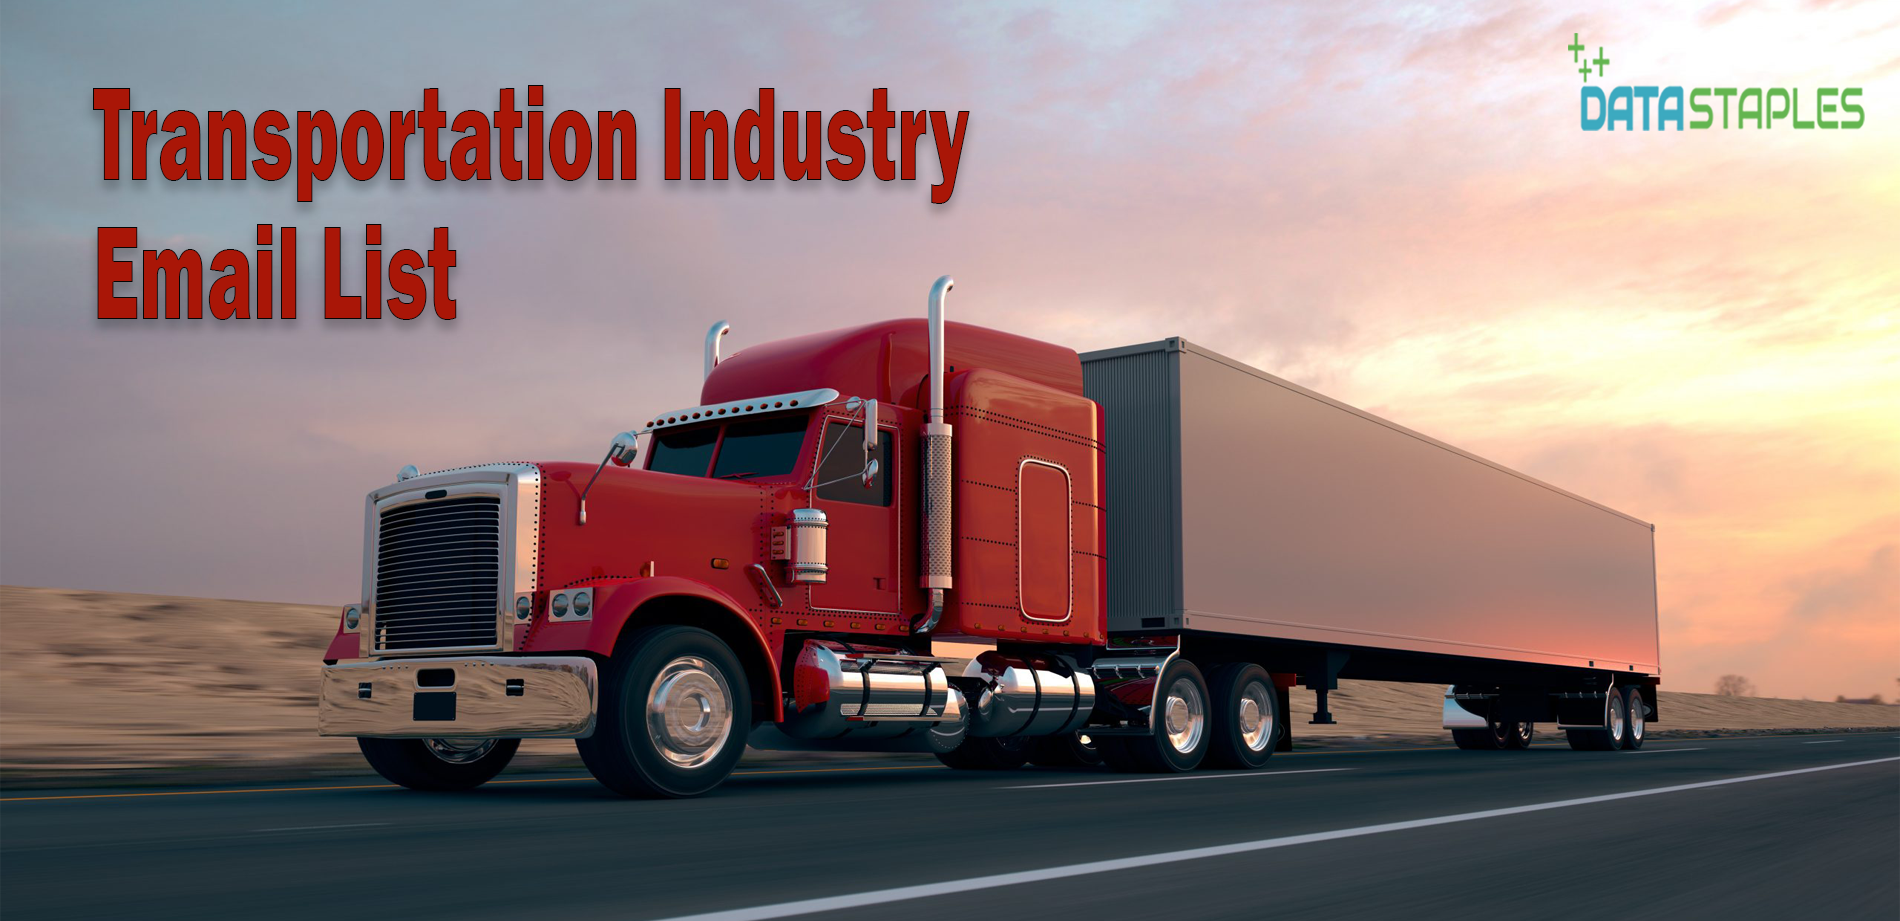 Transportation Industry Email List | DataStaples